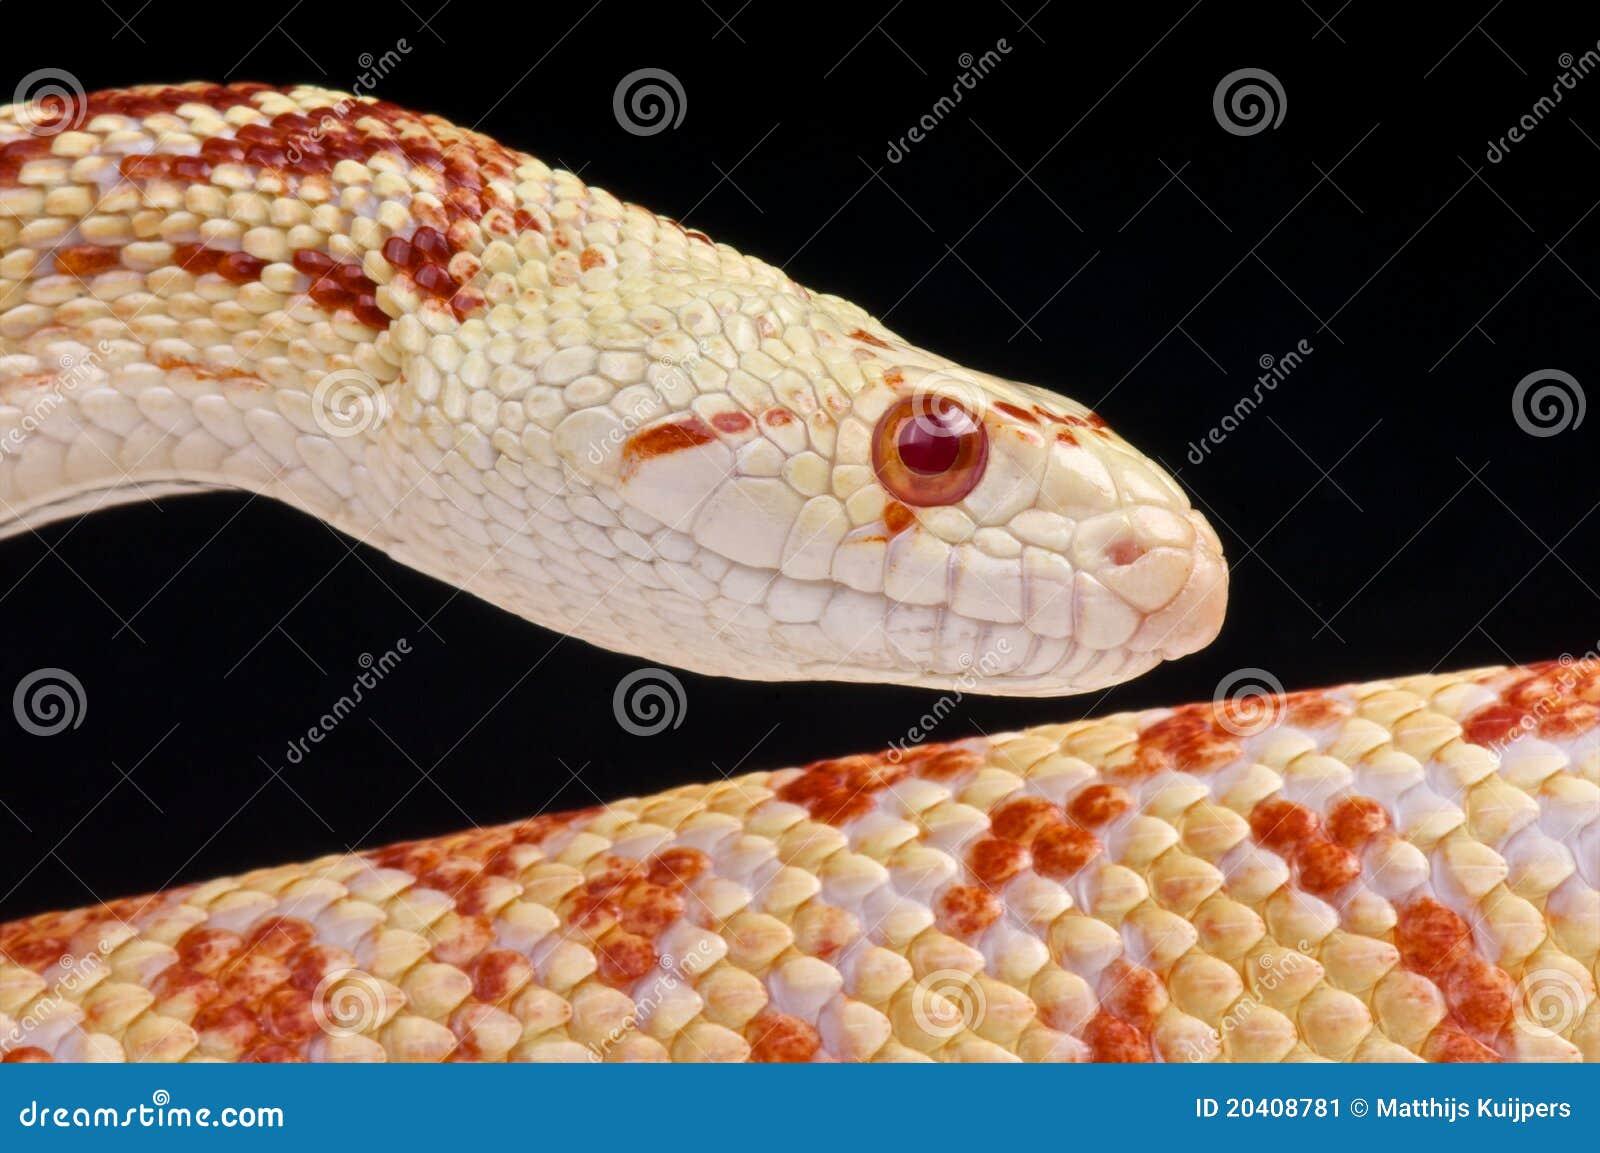 Albino Bullsnake Stock Image - Image: 20408781